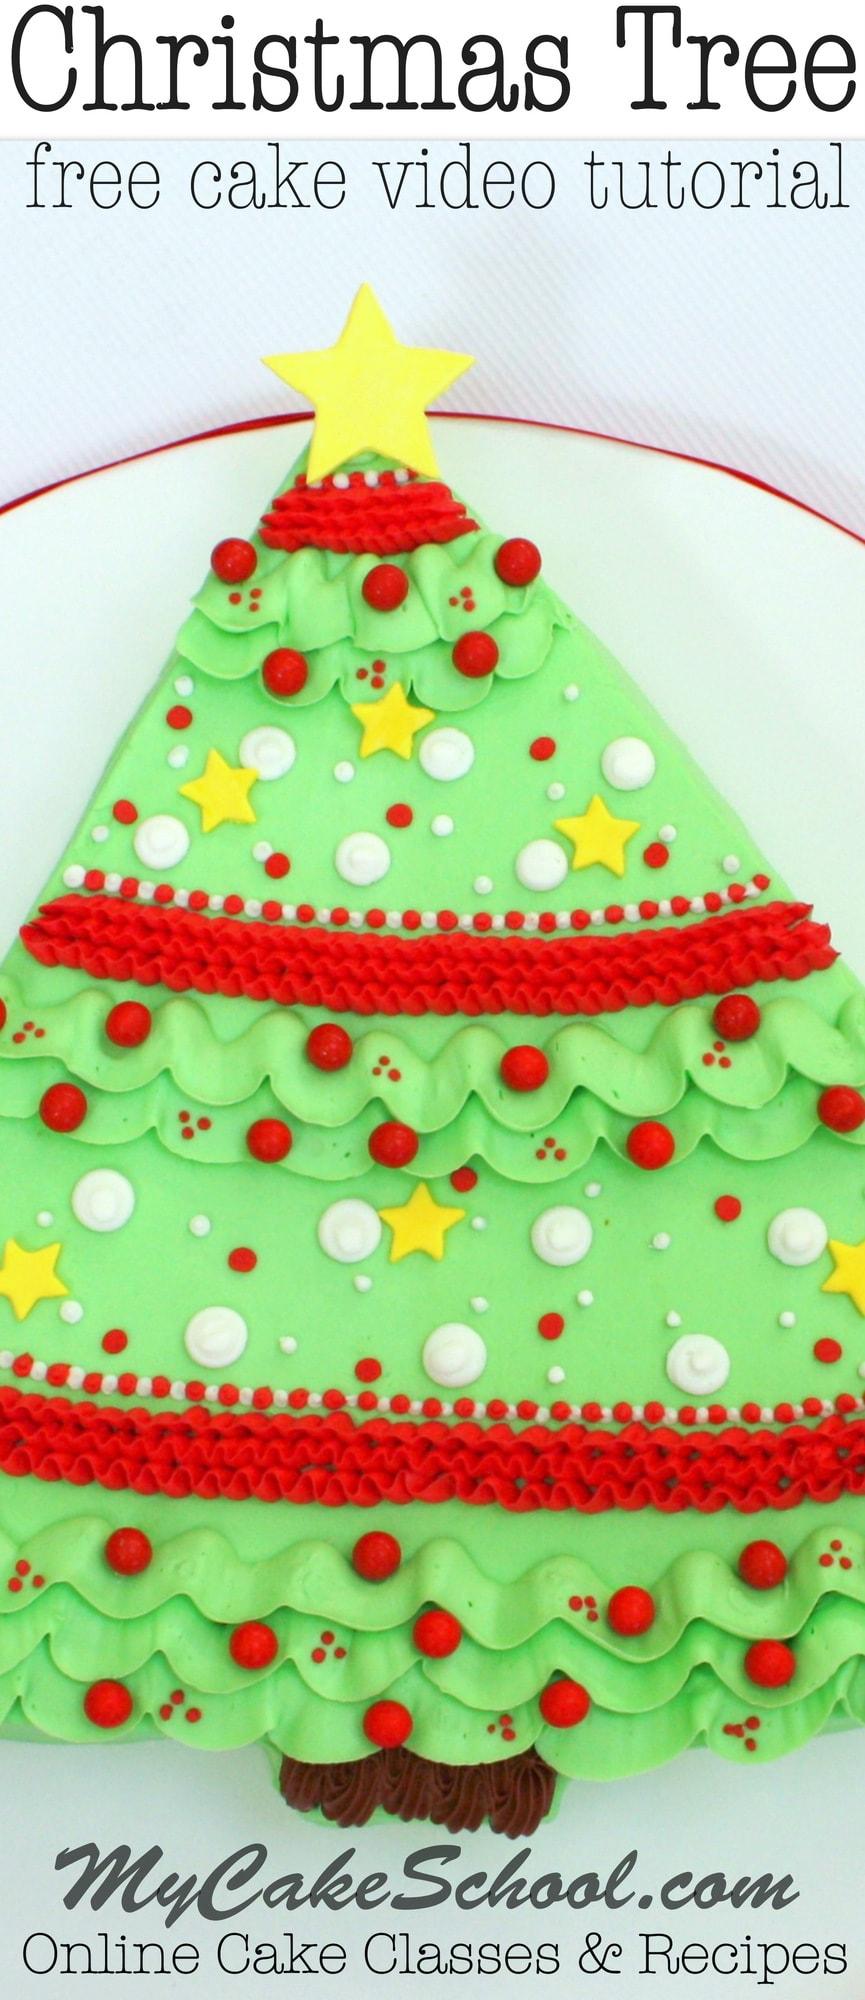 Sweet Christmas Tree Sheet Cake! Free Video Tutorial by MyCakeSchool.com!